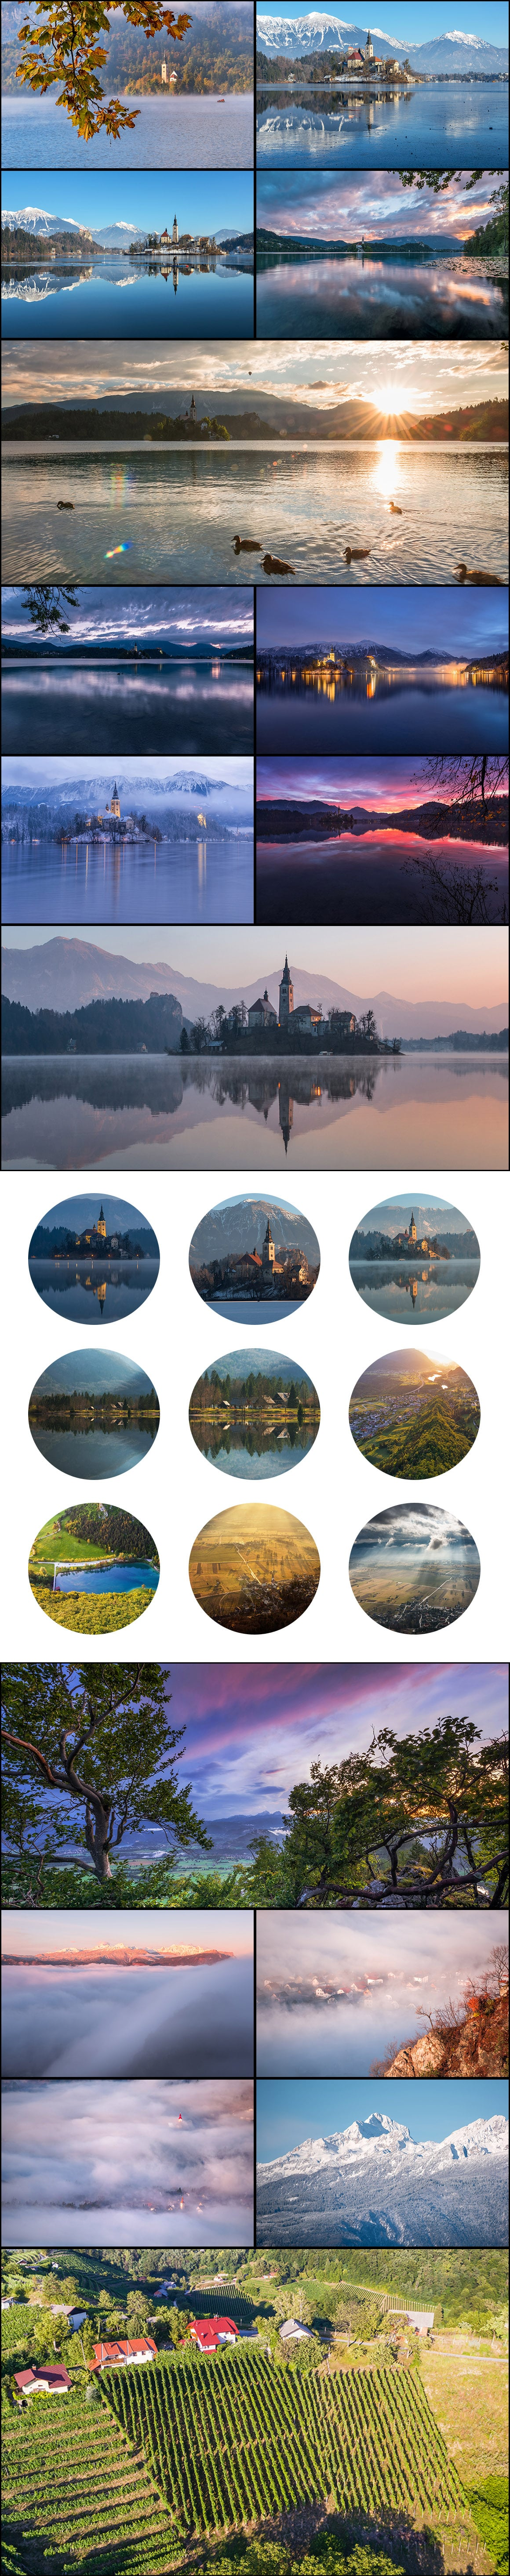 500+ Stock Images. Ultimate Photo Bundle  – $59 - PREVIEW landscapes1